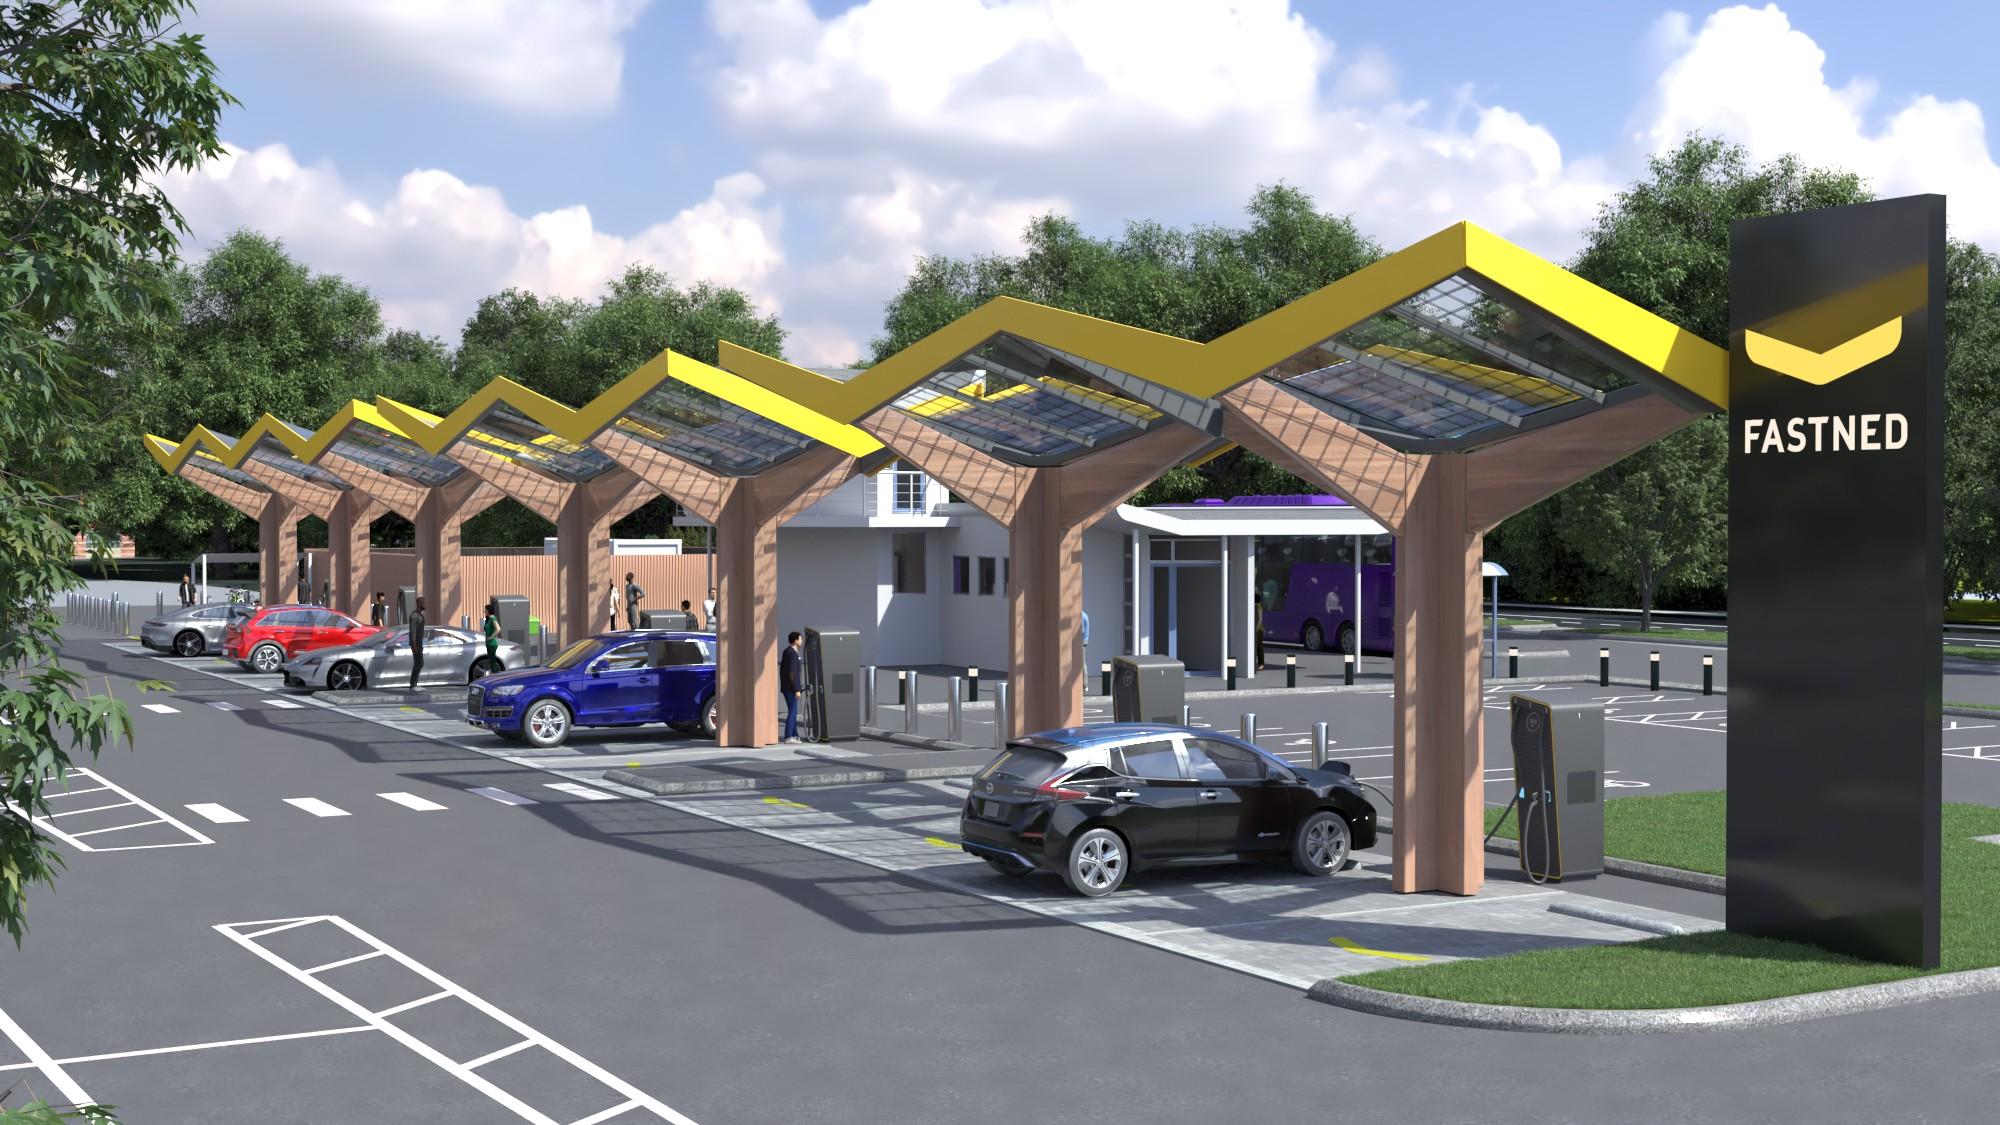 tesla-fastned-charging-station-uk-europe